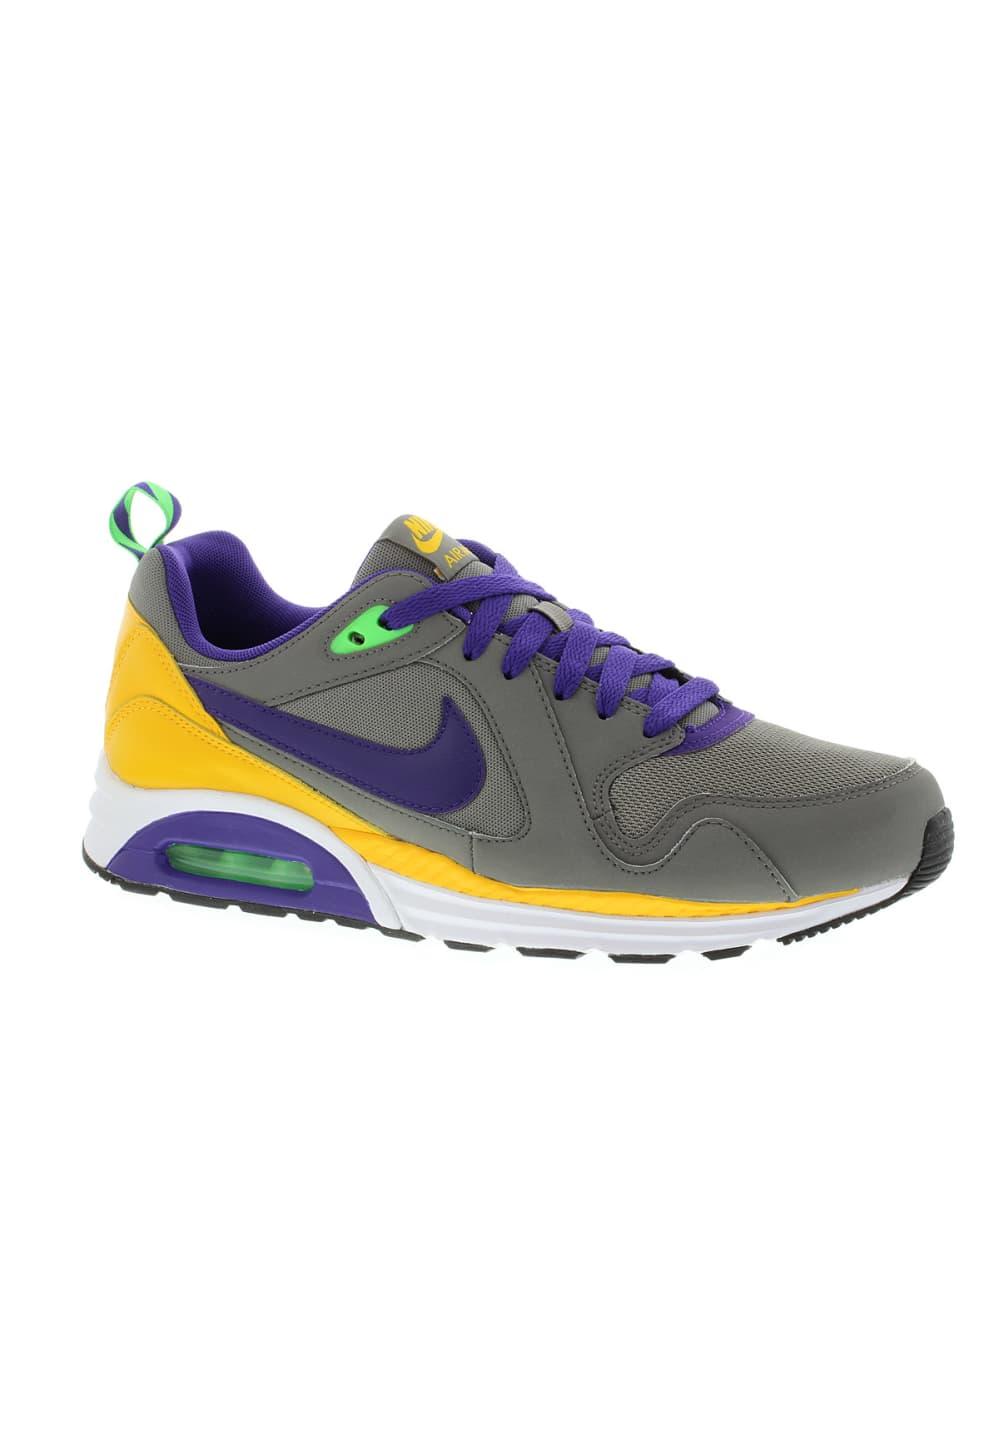 90b0dabe8d866 Nike Air Max Trax - Sneaker for Men - Grey